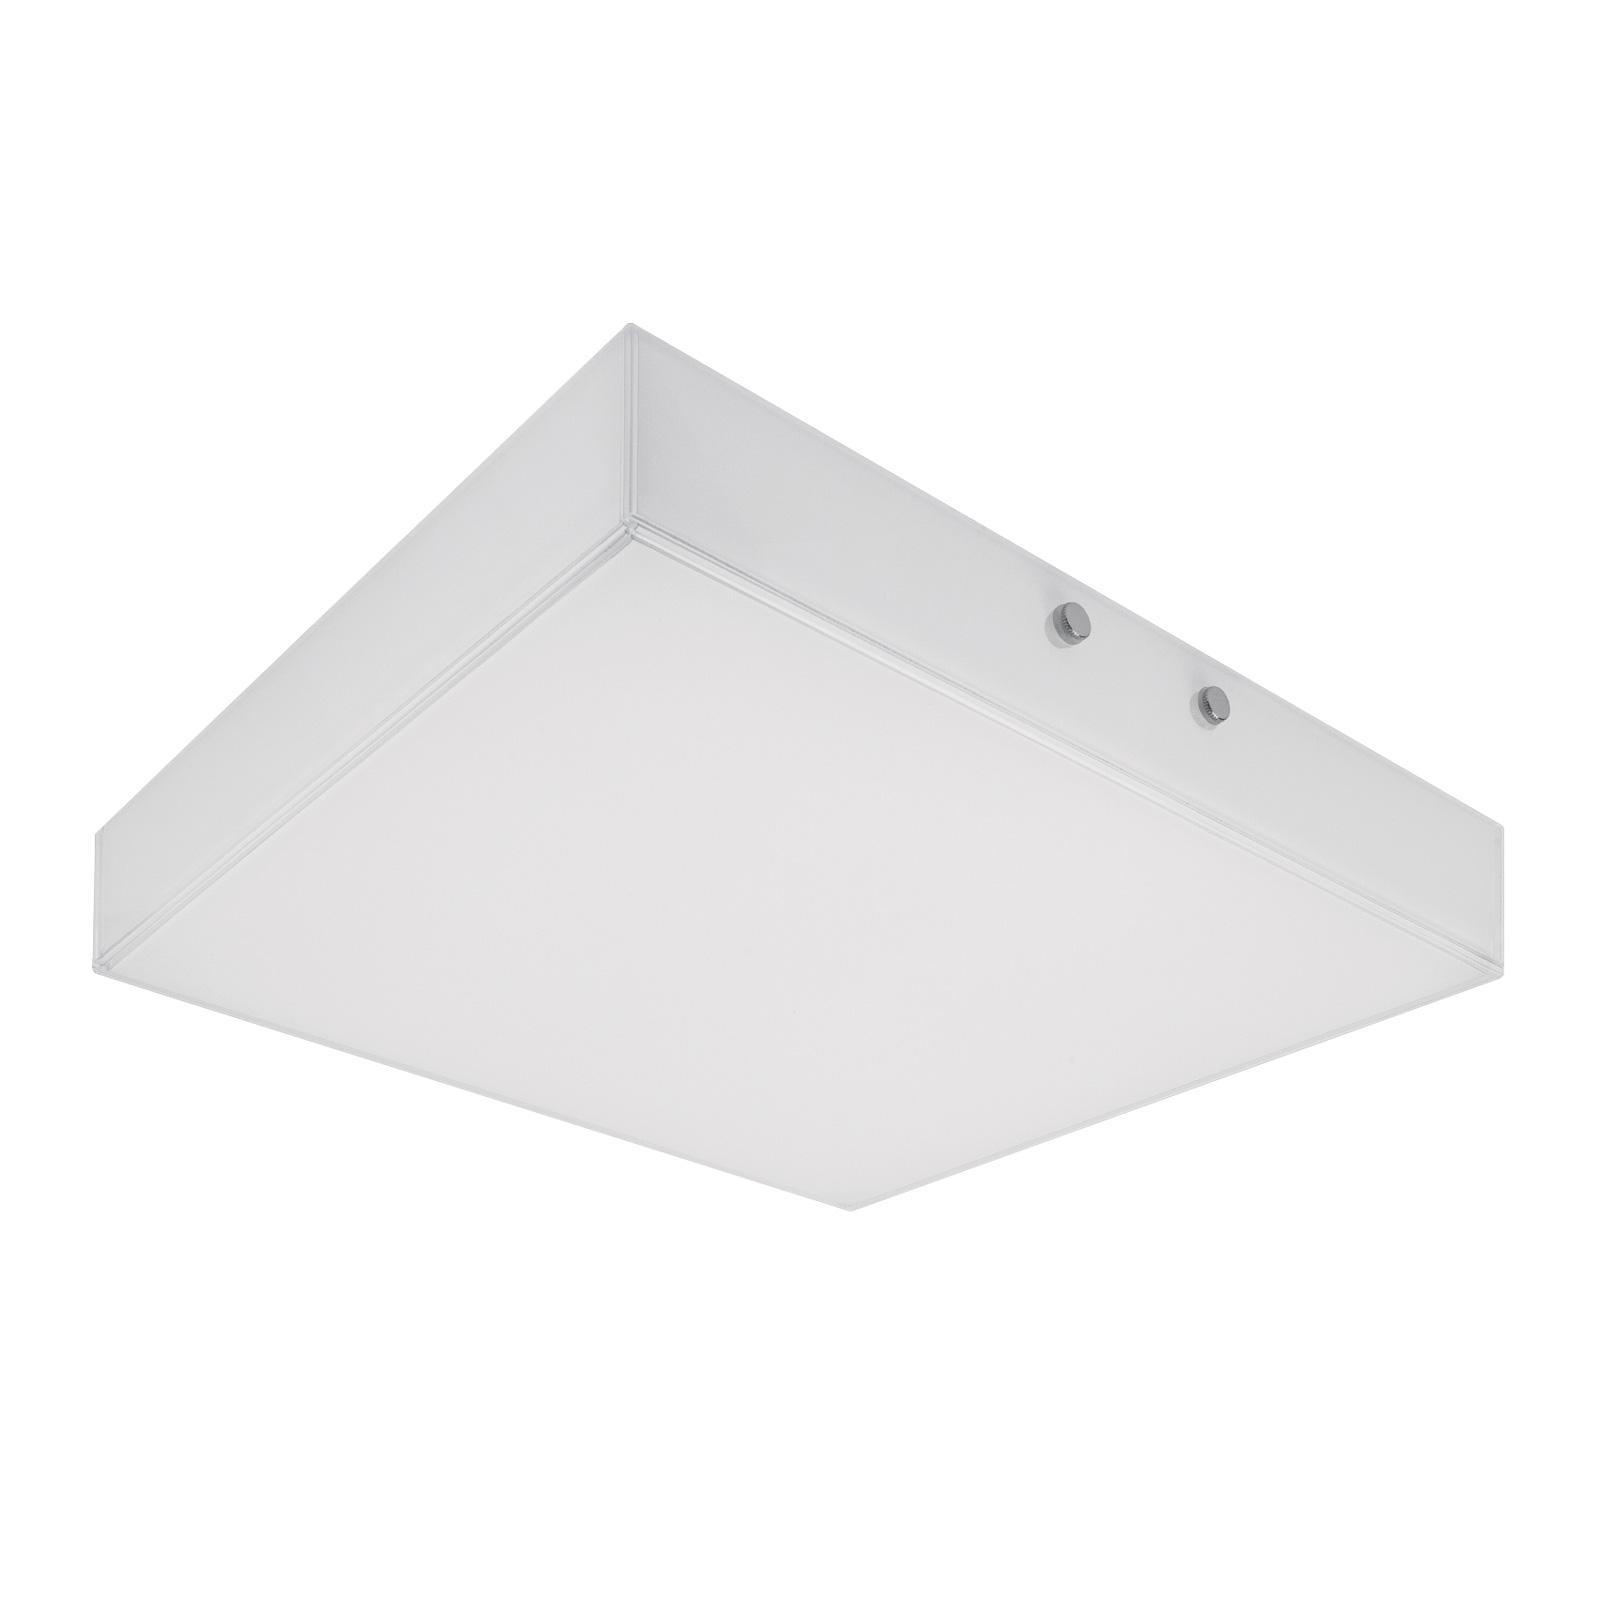 LEDVANCE Lunive Quadro plafonnier 30cm 3000K